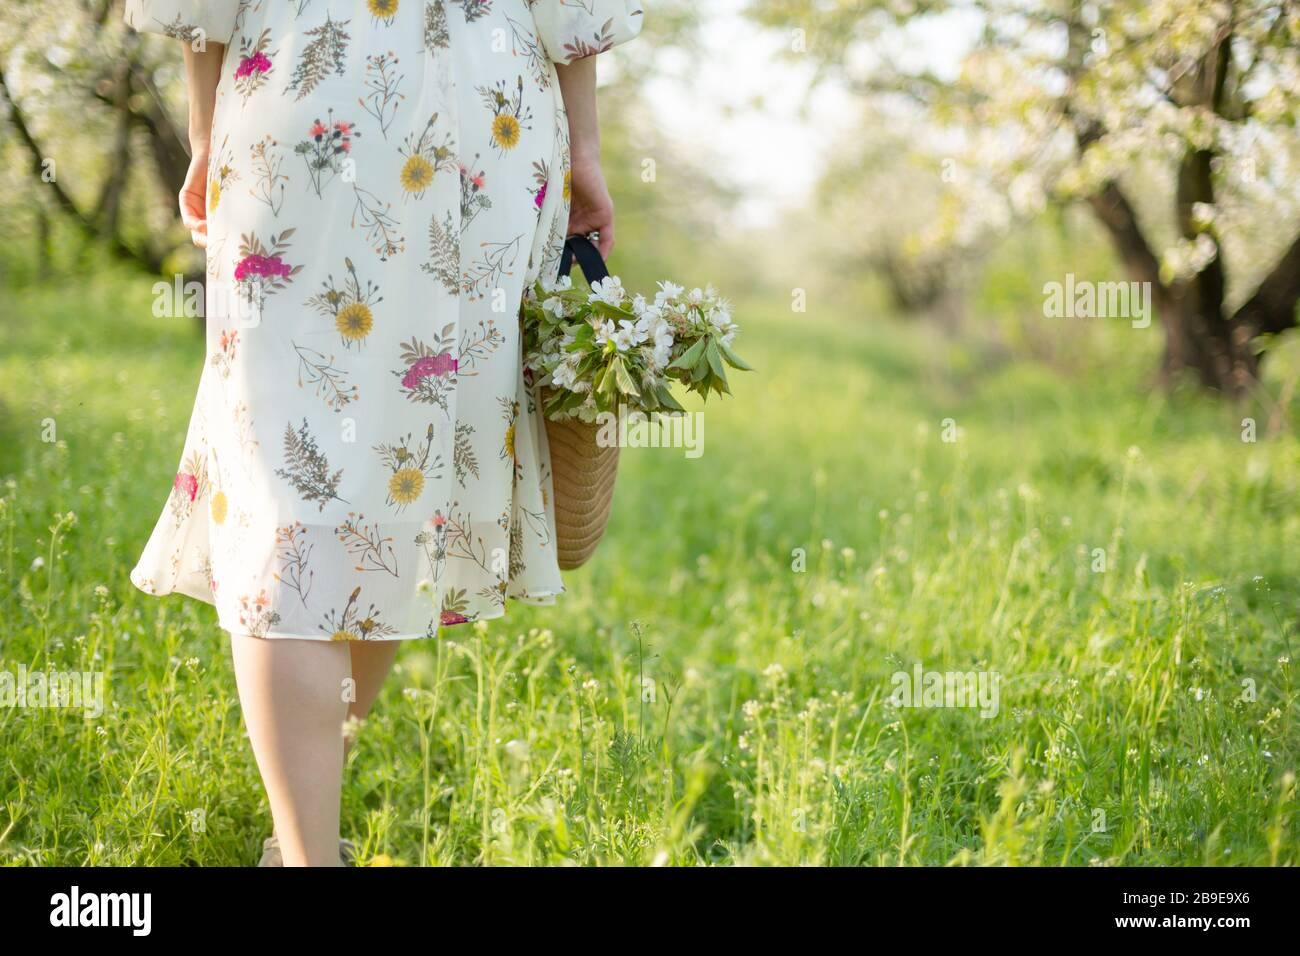 A girl walks through a spring green park enjoying the blooming nature. Stock Photo